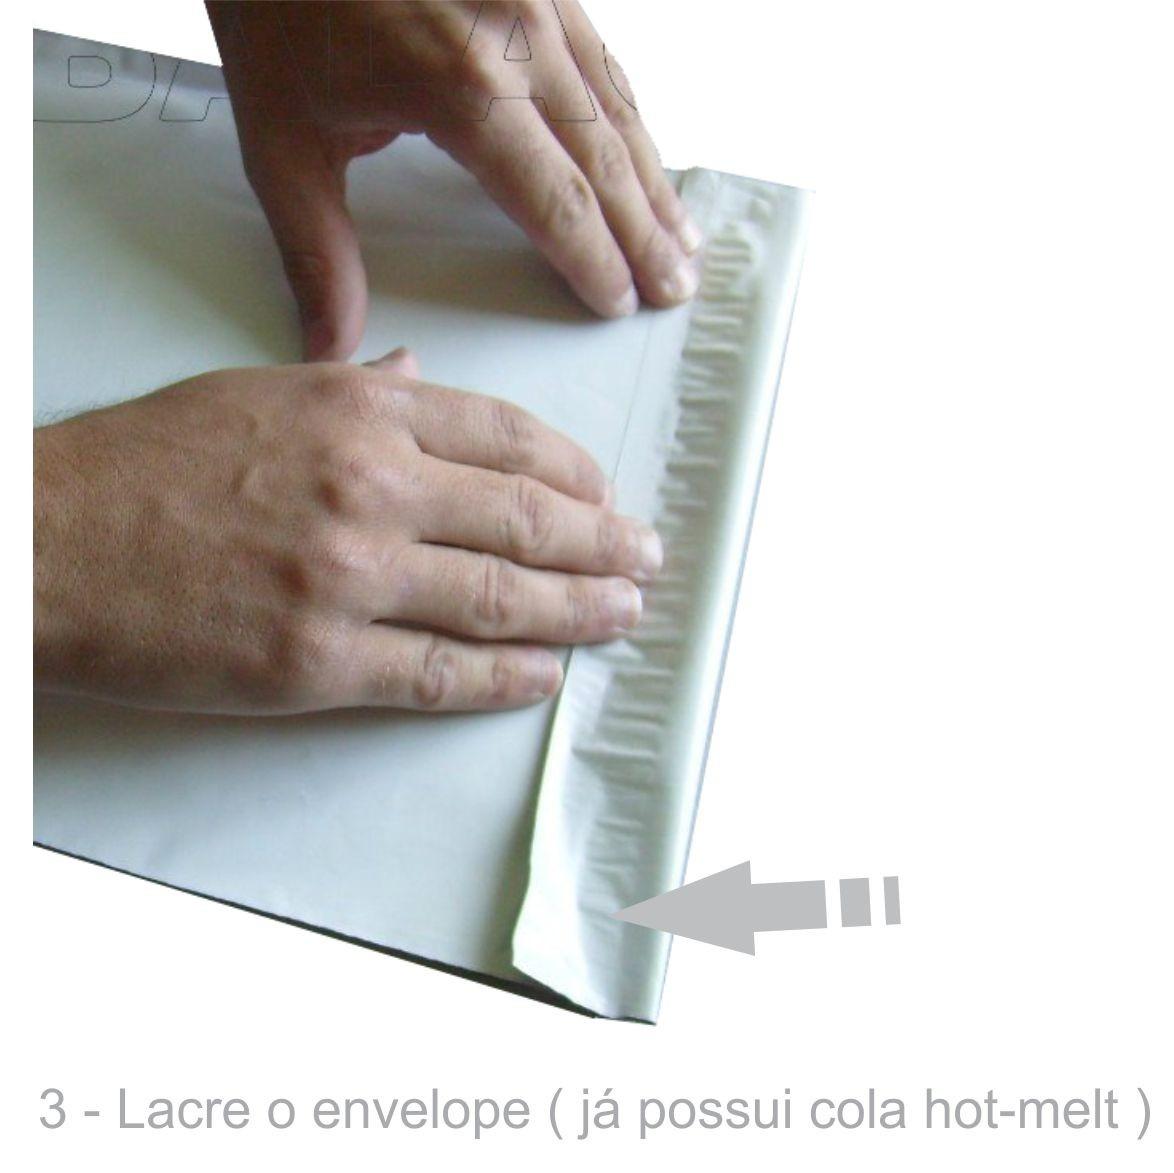 Envelope Plástico Segurança Lacre Tipo Sedex 32x40 (250 Unidades ou 500 Unidades)